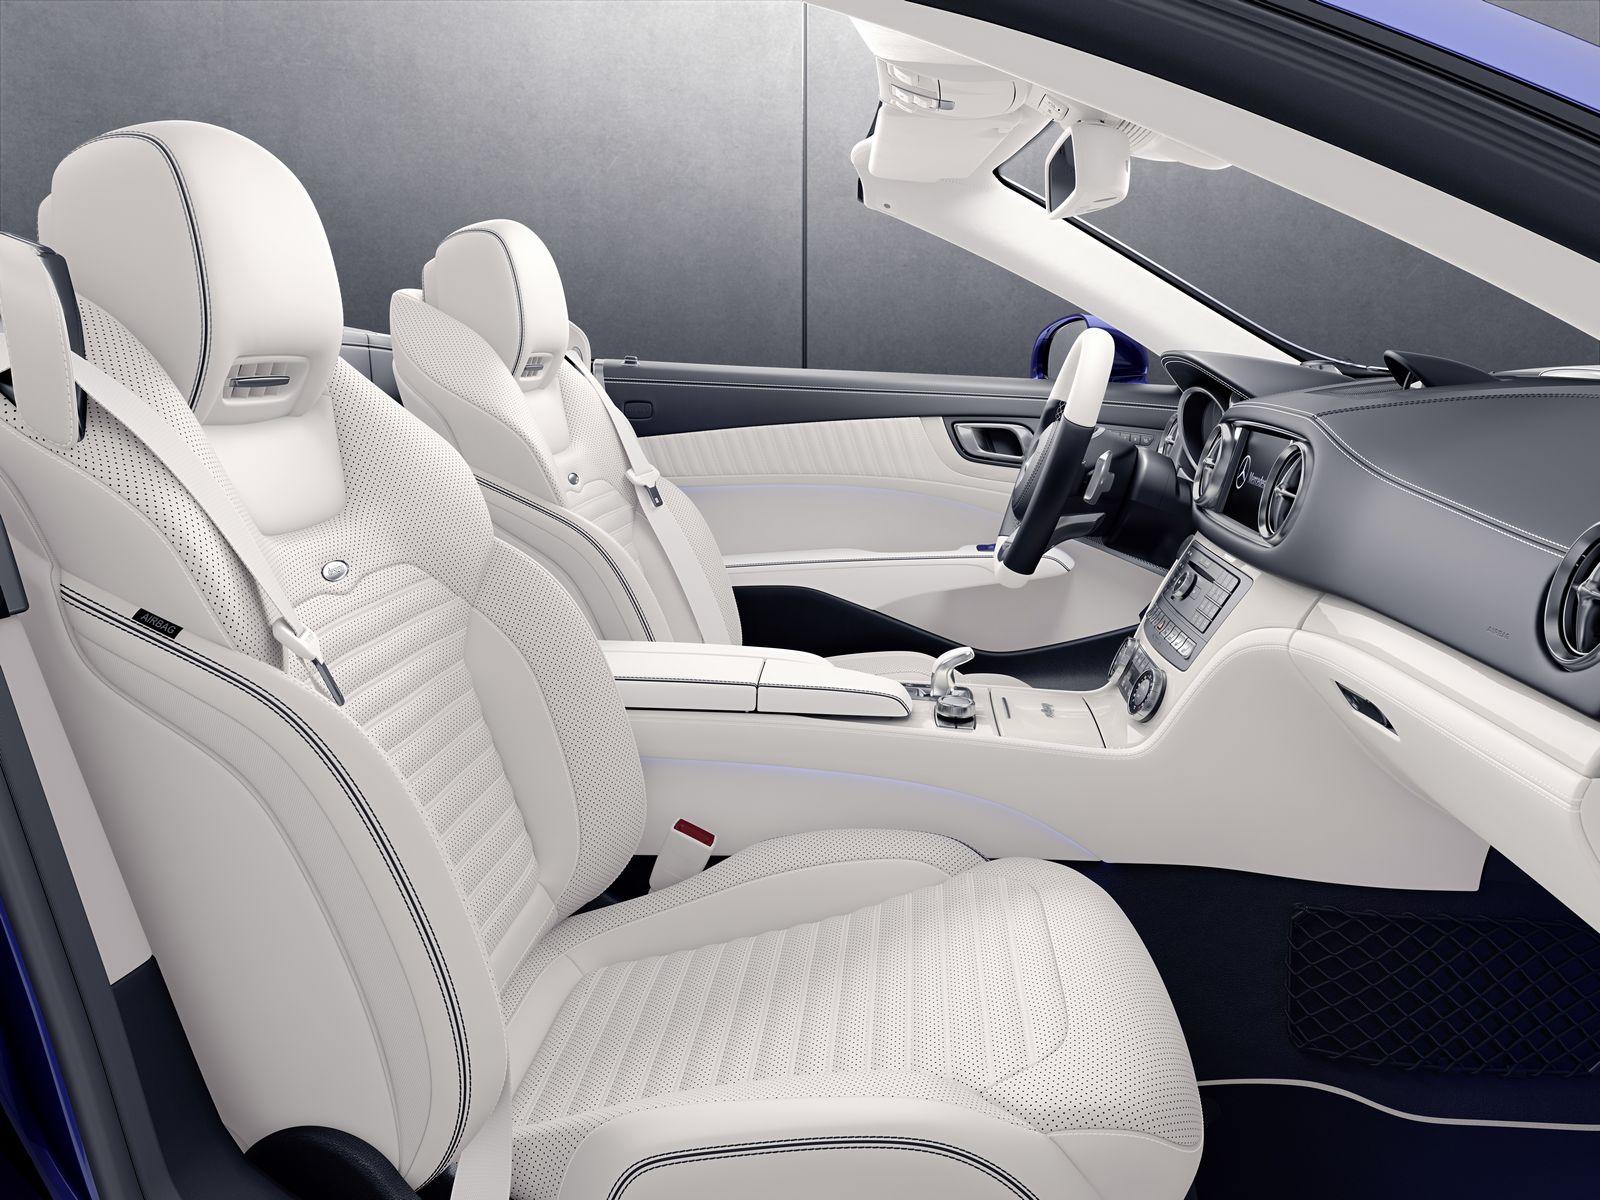 2015 - [Mercedes] SL Restylé [R231] - Page 4 Mercedes%2BSL%2Band%2BSLC%2B-%2B18